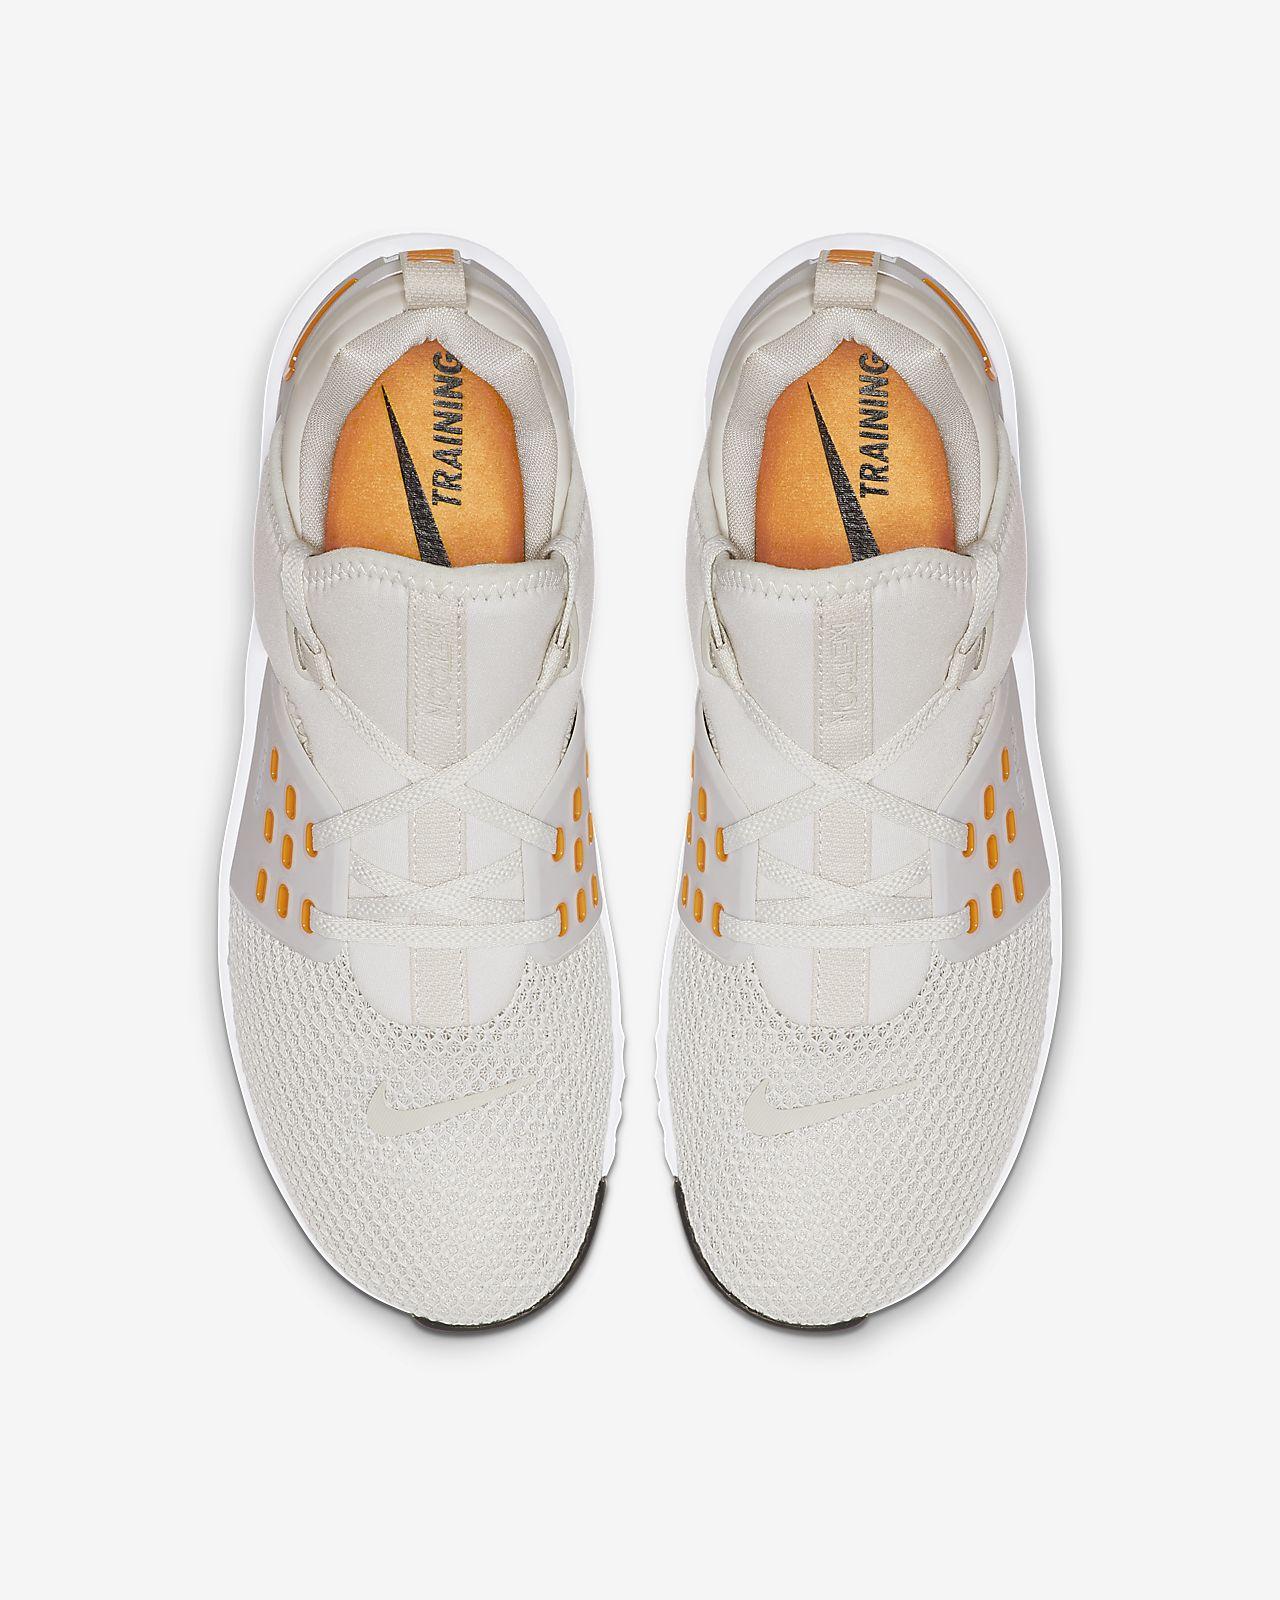 promo code 53de1 70bfb ... Chaussure de training Nike Free X Metcon 2 pour Homme